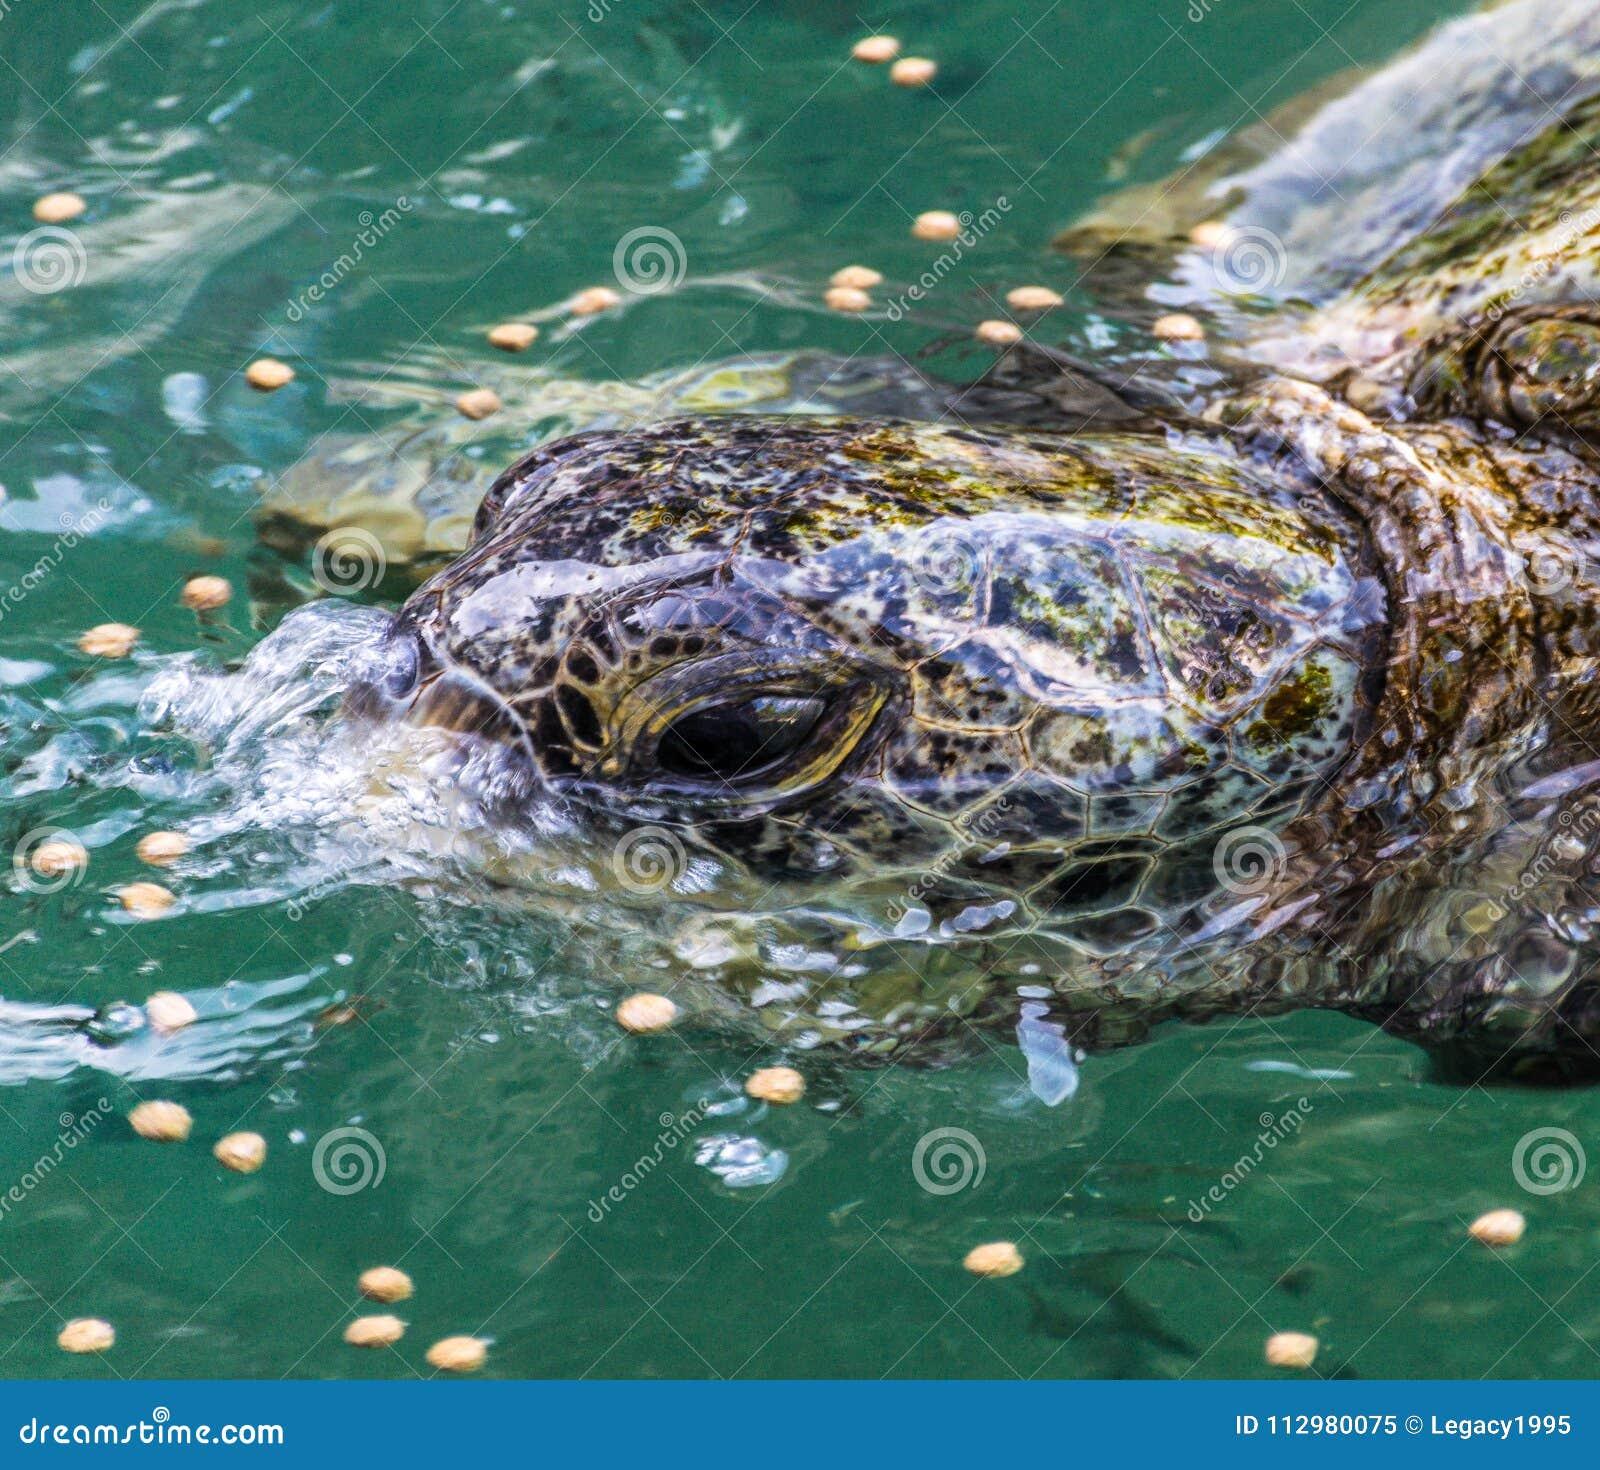 Tropical Sea Turtles Feeding